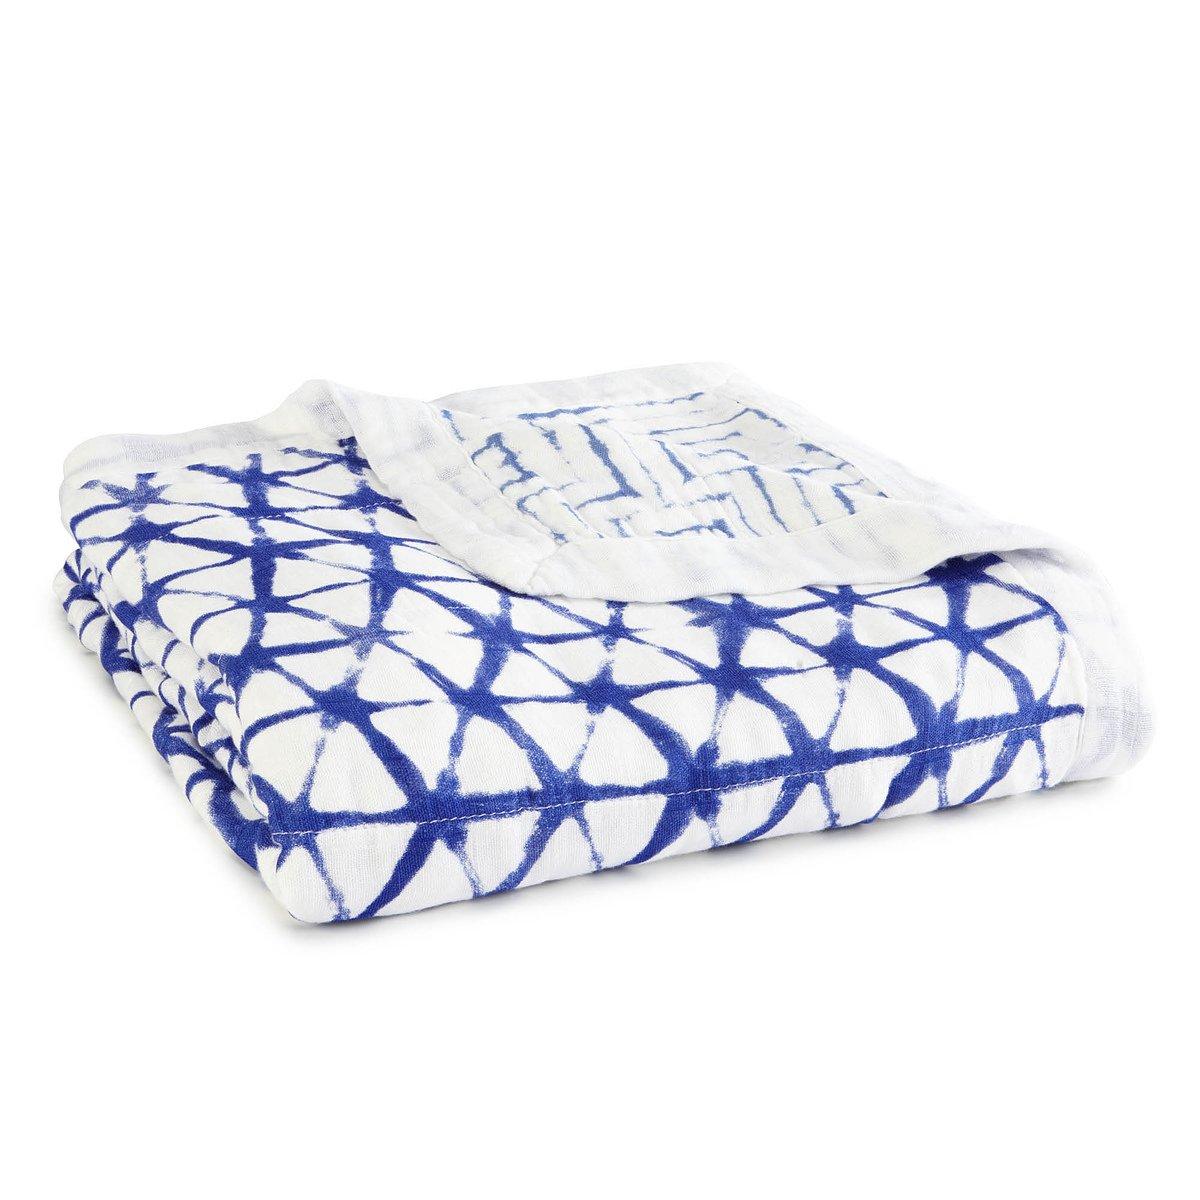 aden + anais Silky Soft Dream Blanket; 100% Viscose Bamboo Muslin; 4 Layer Lightweight and Breathable; 47 X 47 inch; Indigo Shibori - Blue